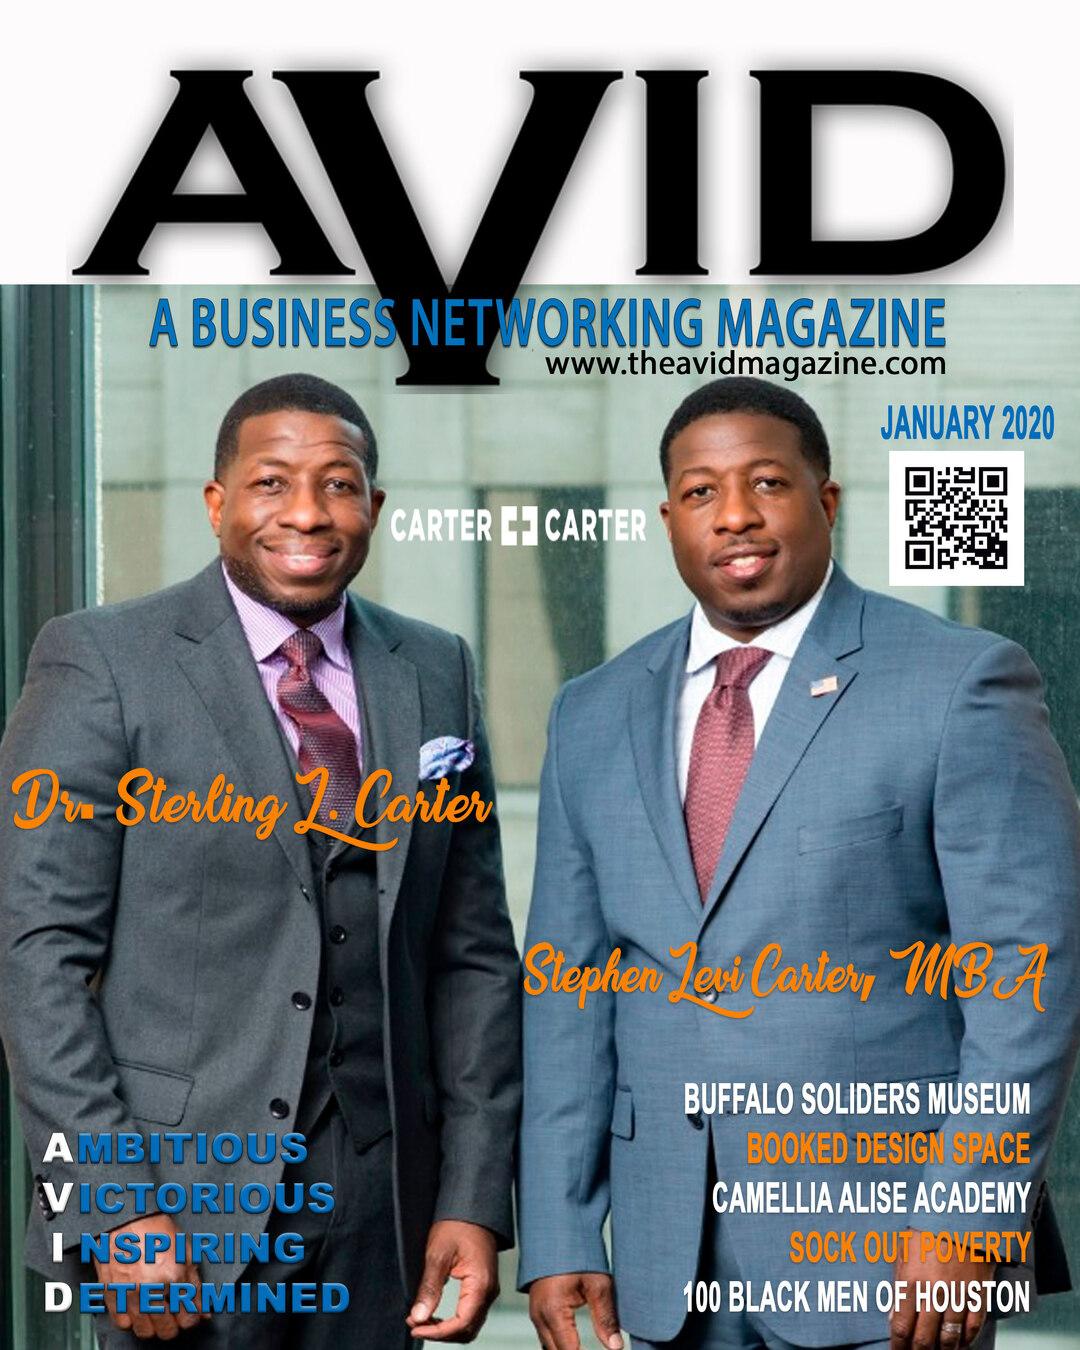 Page 1 of AVID Magazine